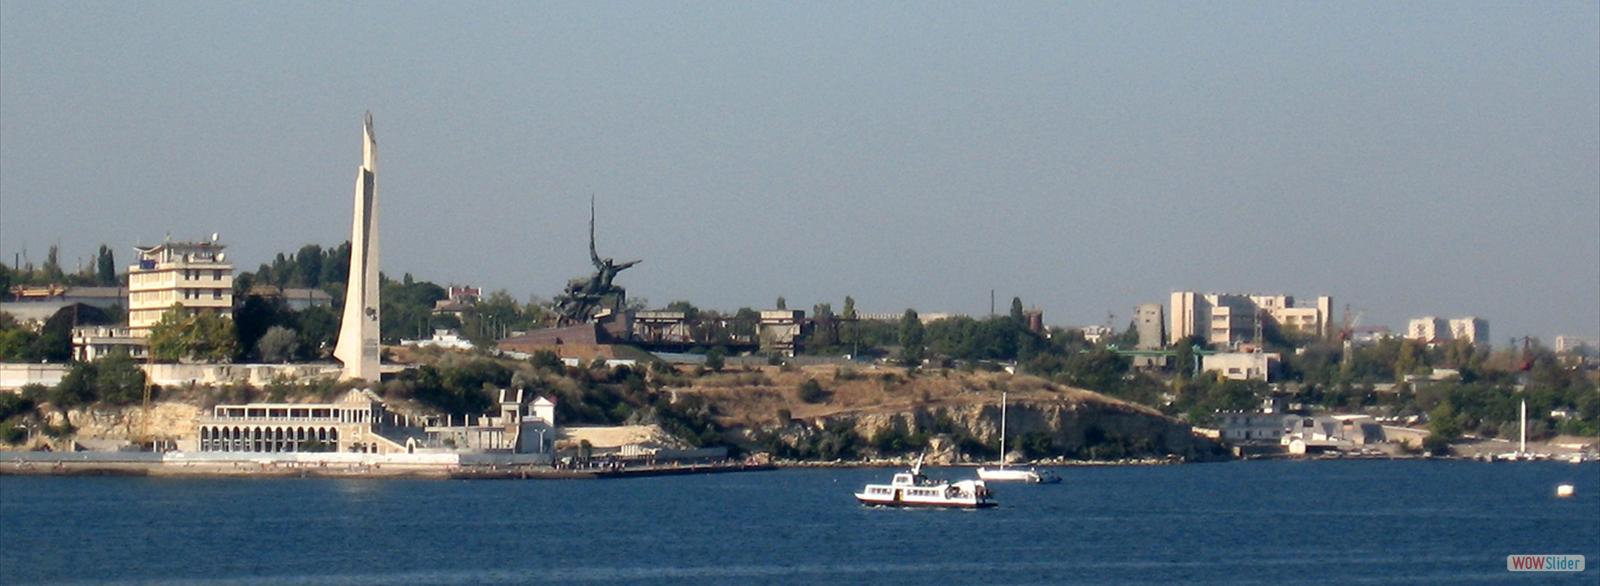 Артбухта